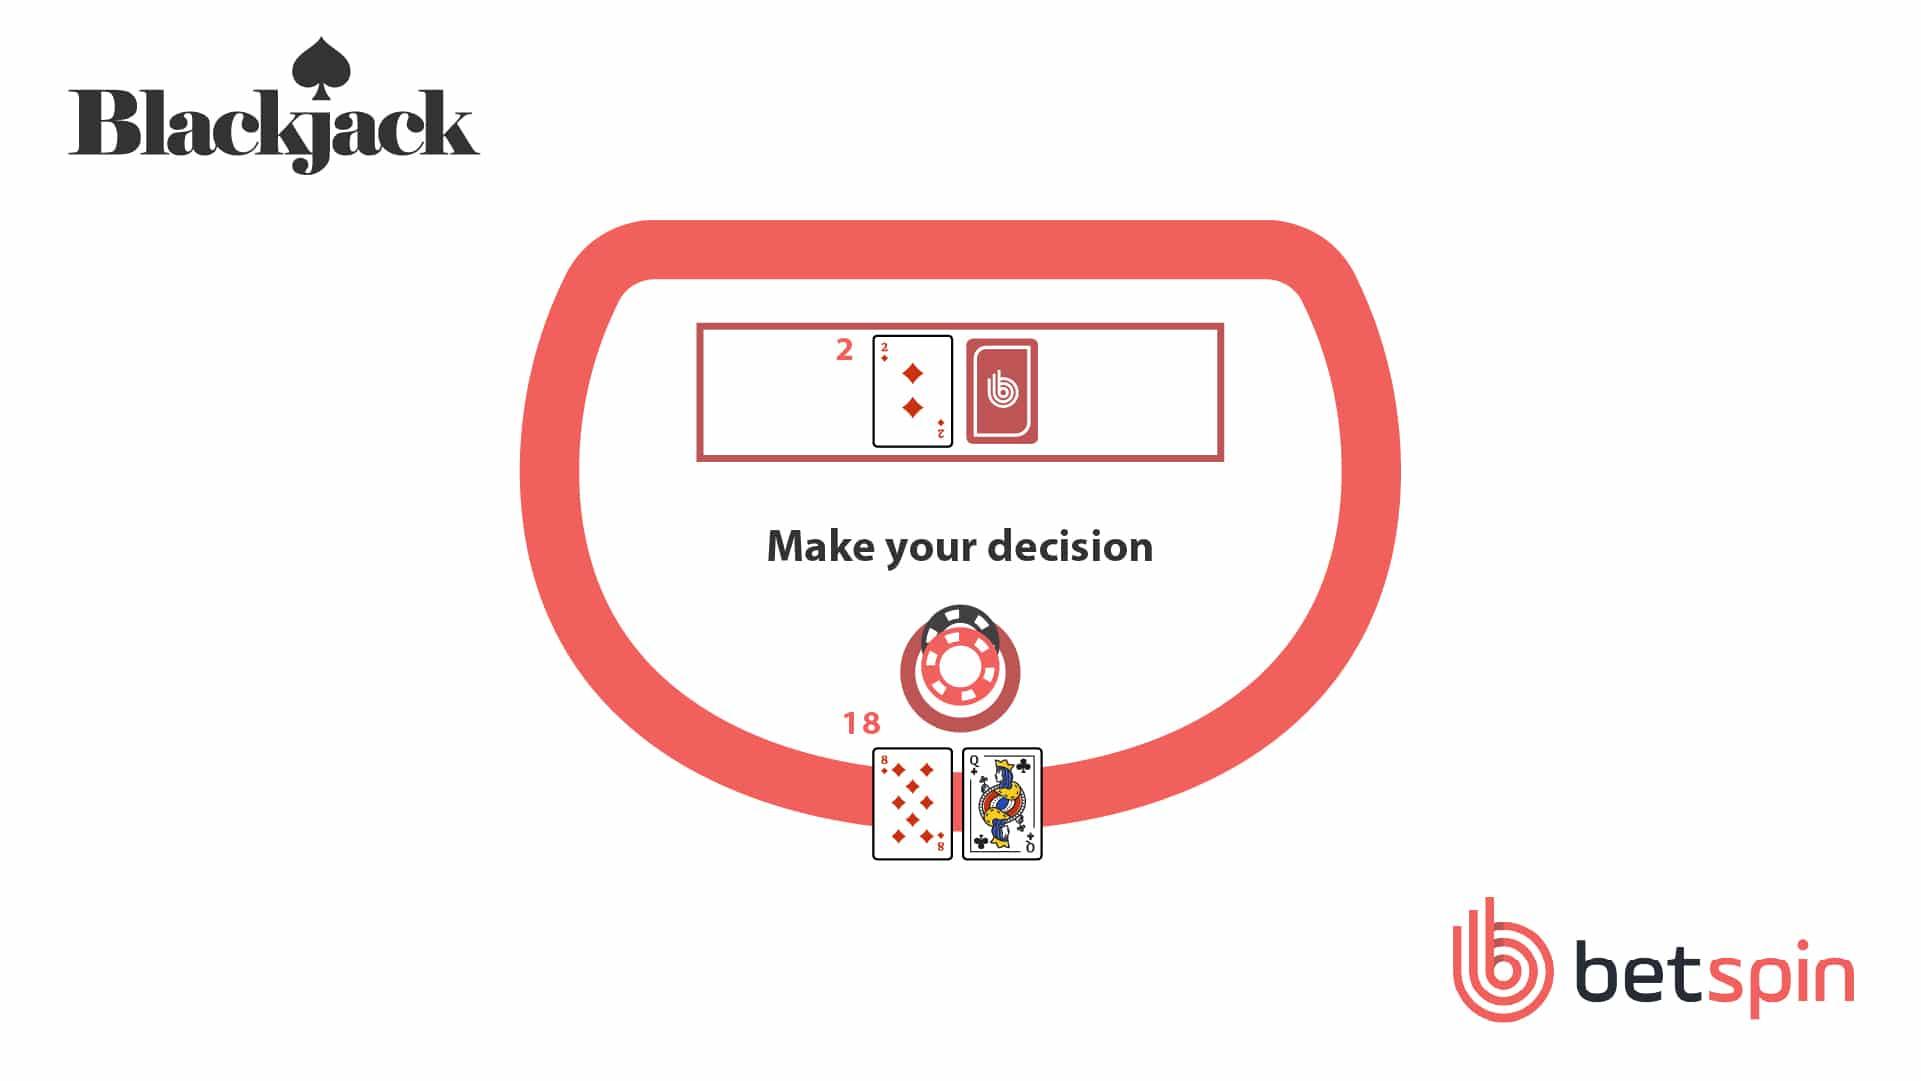 Blackjack Step 2